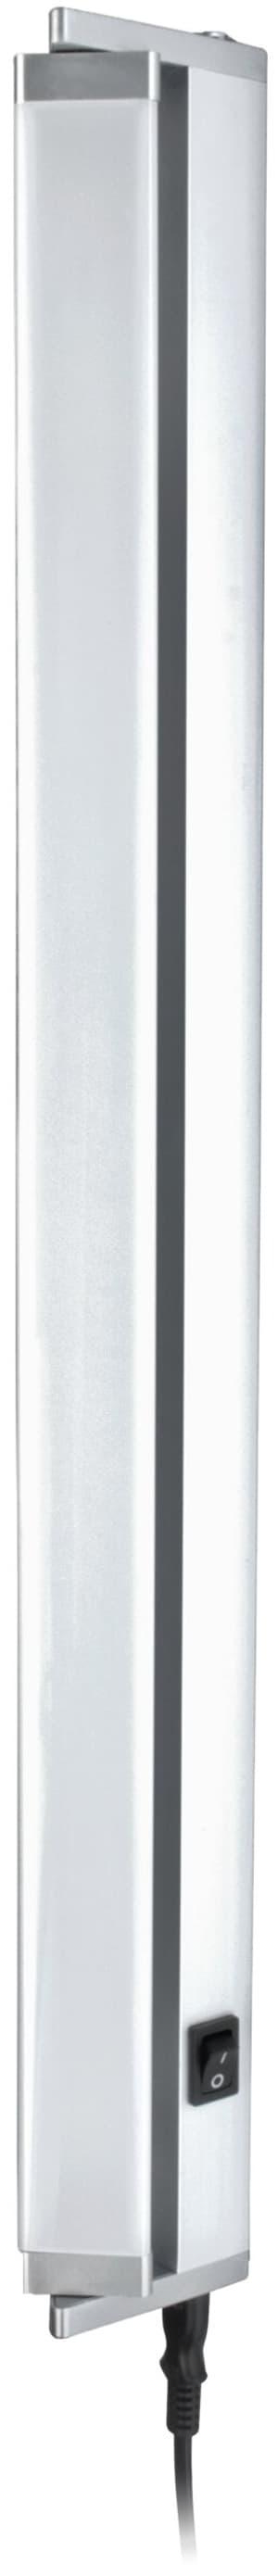 Luminaire LED sous meuble 10,5 W, mobile